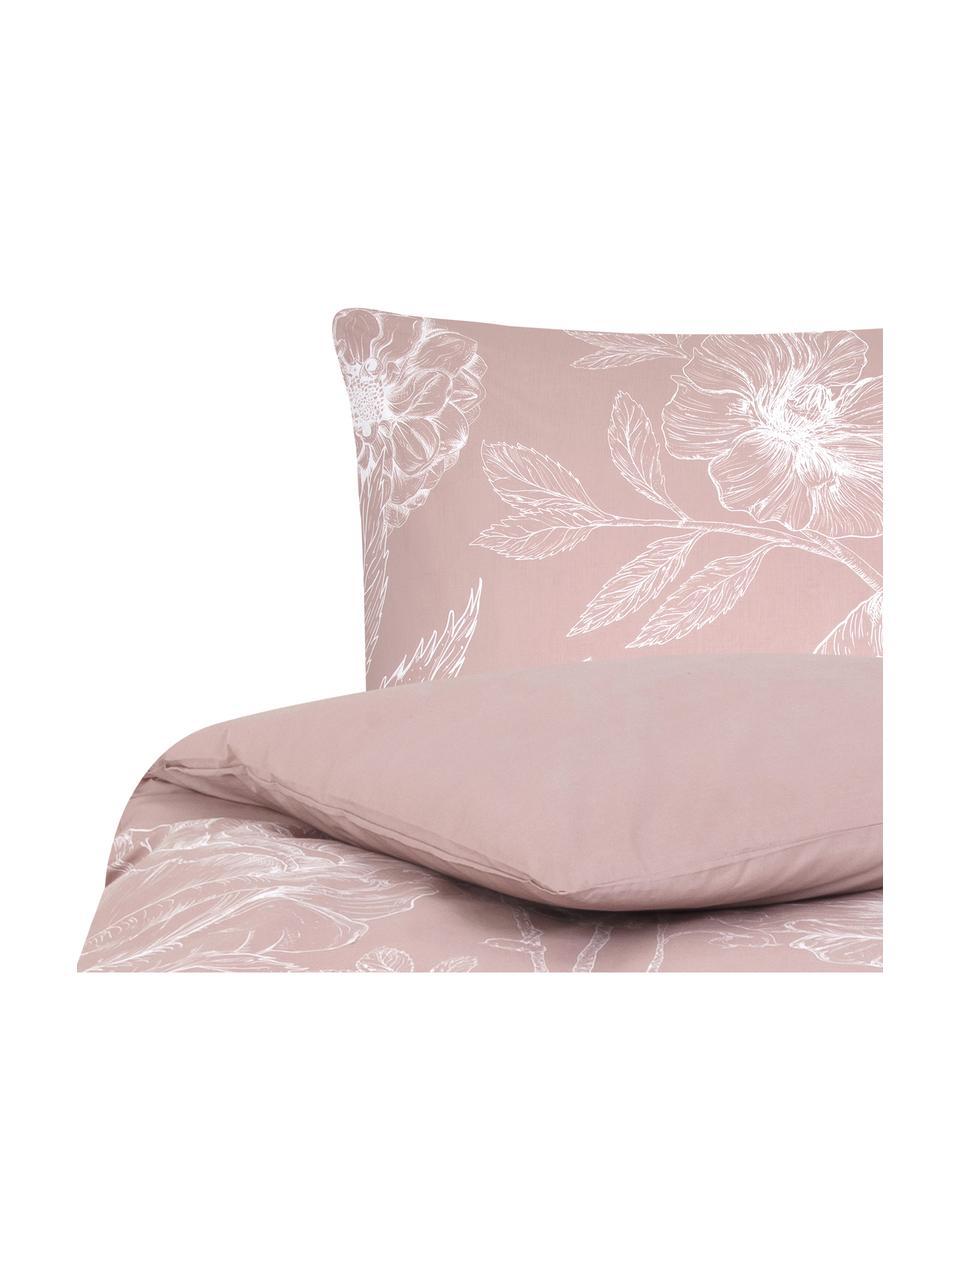 Baumwollperkal-Bettwäsche Keno mit Blumenprint, Webart: Perkal Fadendichte 180 TC, Altrosa, Weiß, 135 x 200 cm + 1 Kissen 80 x 80 cm